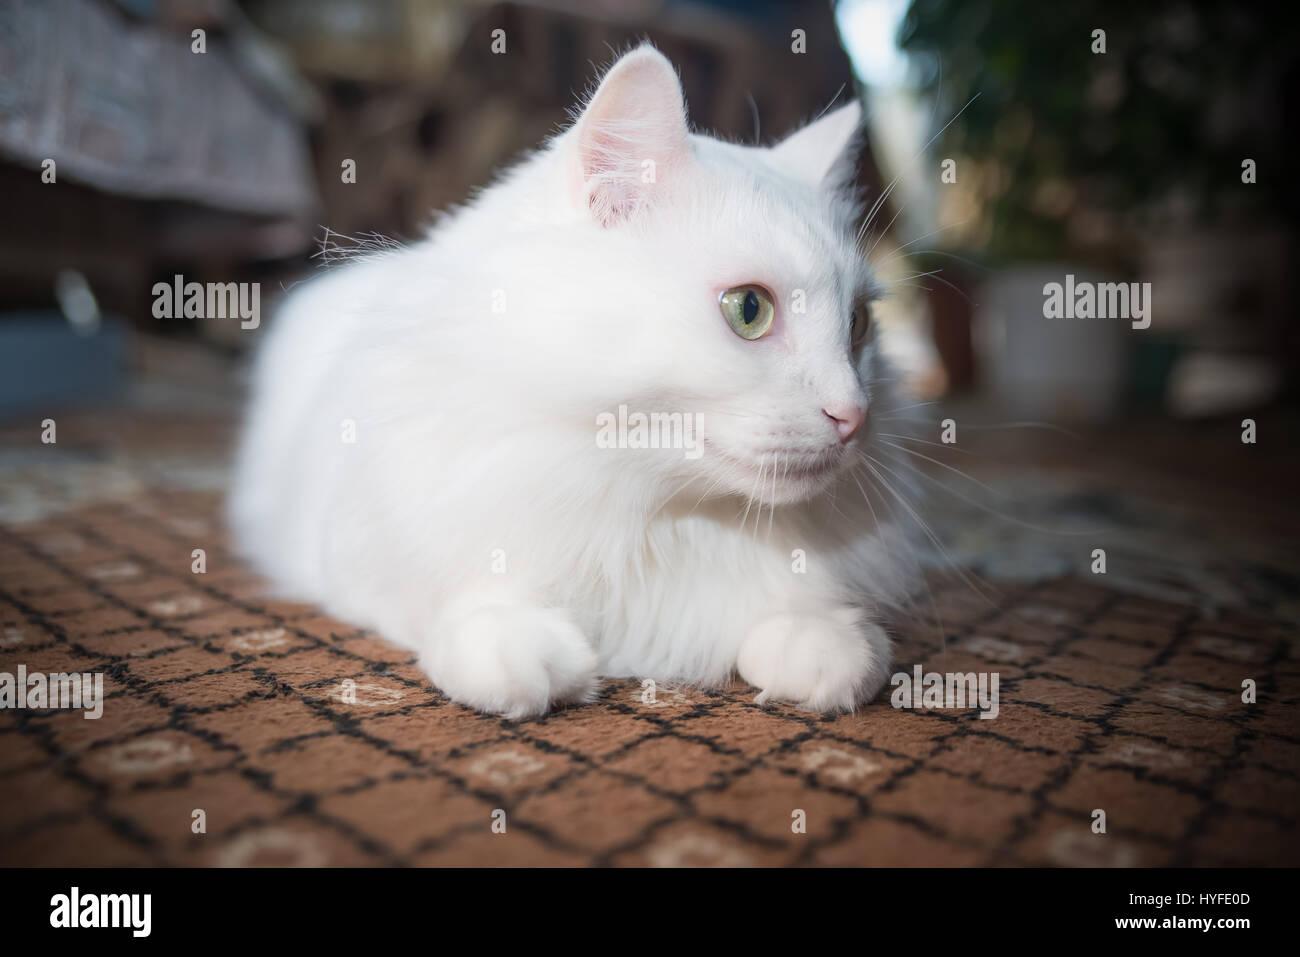 White cat breed Persian angora on black background Stock